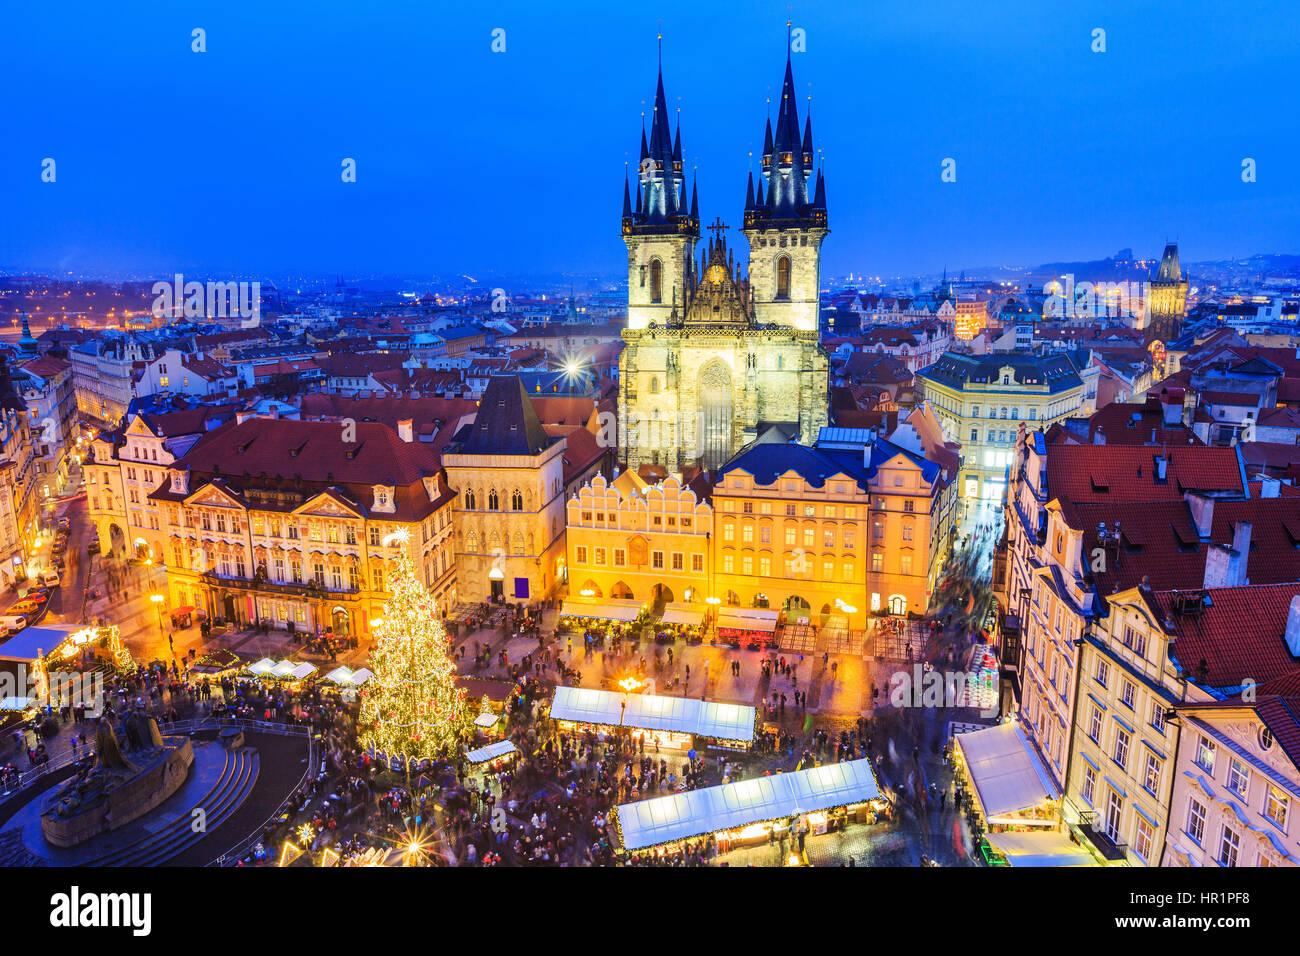 Prague, Czech Repubilc. Christmas market at Old Town Square. - Stock Image